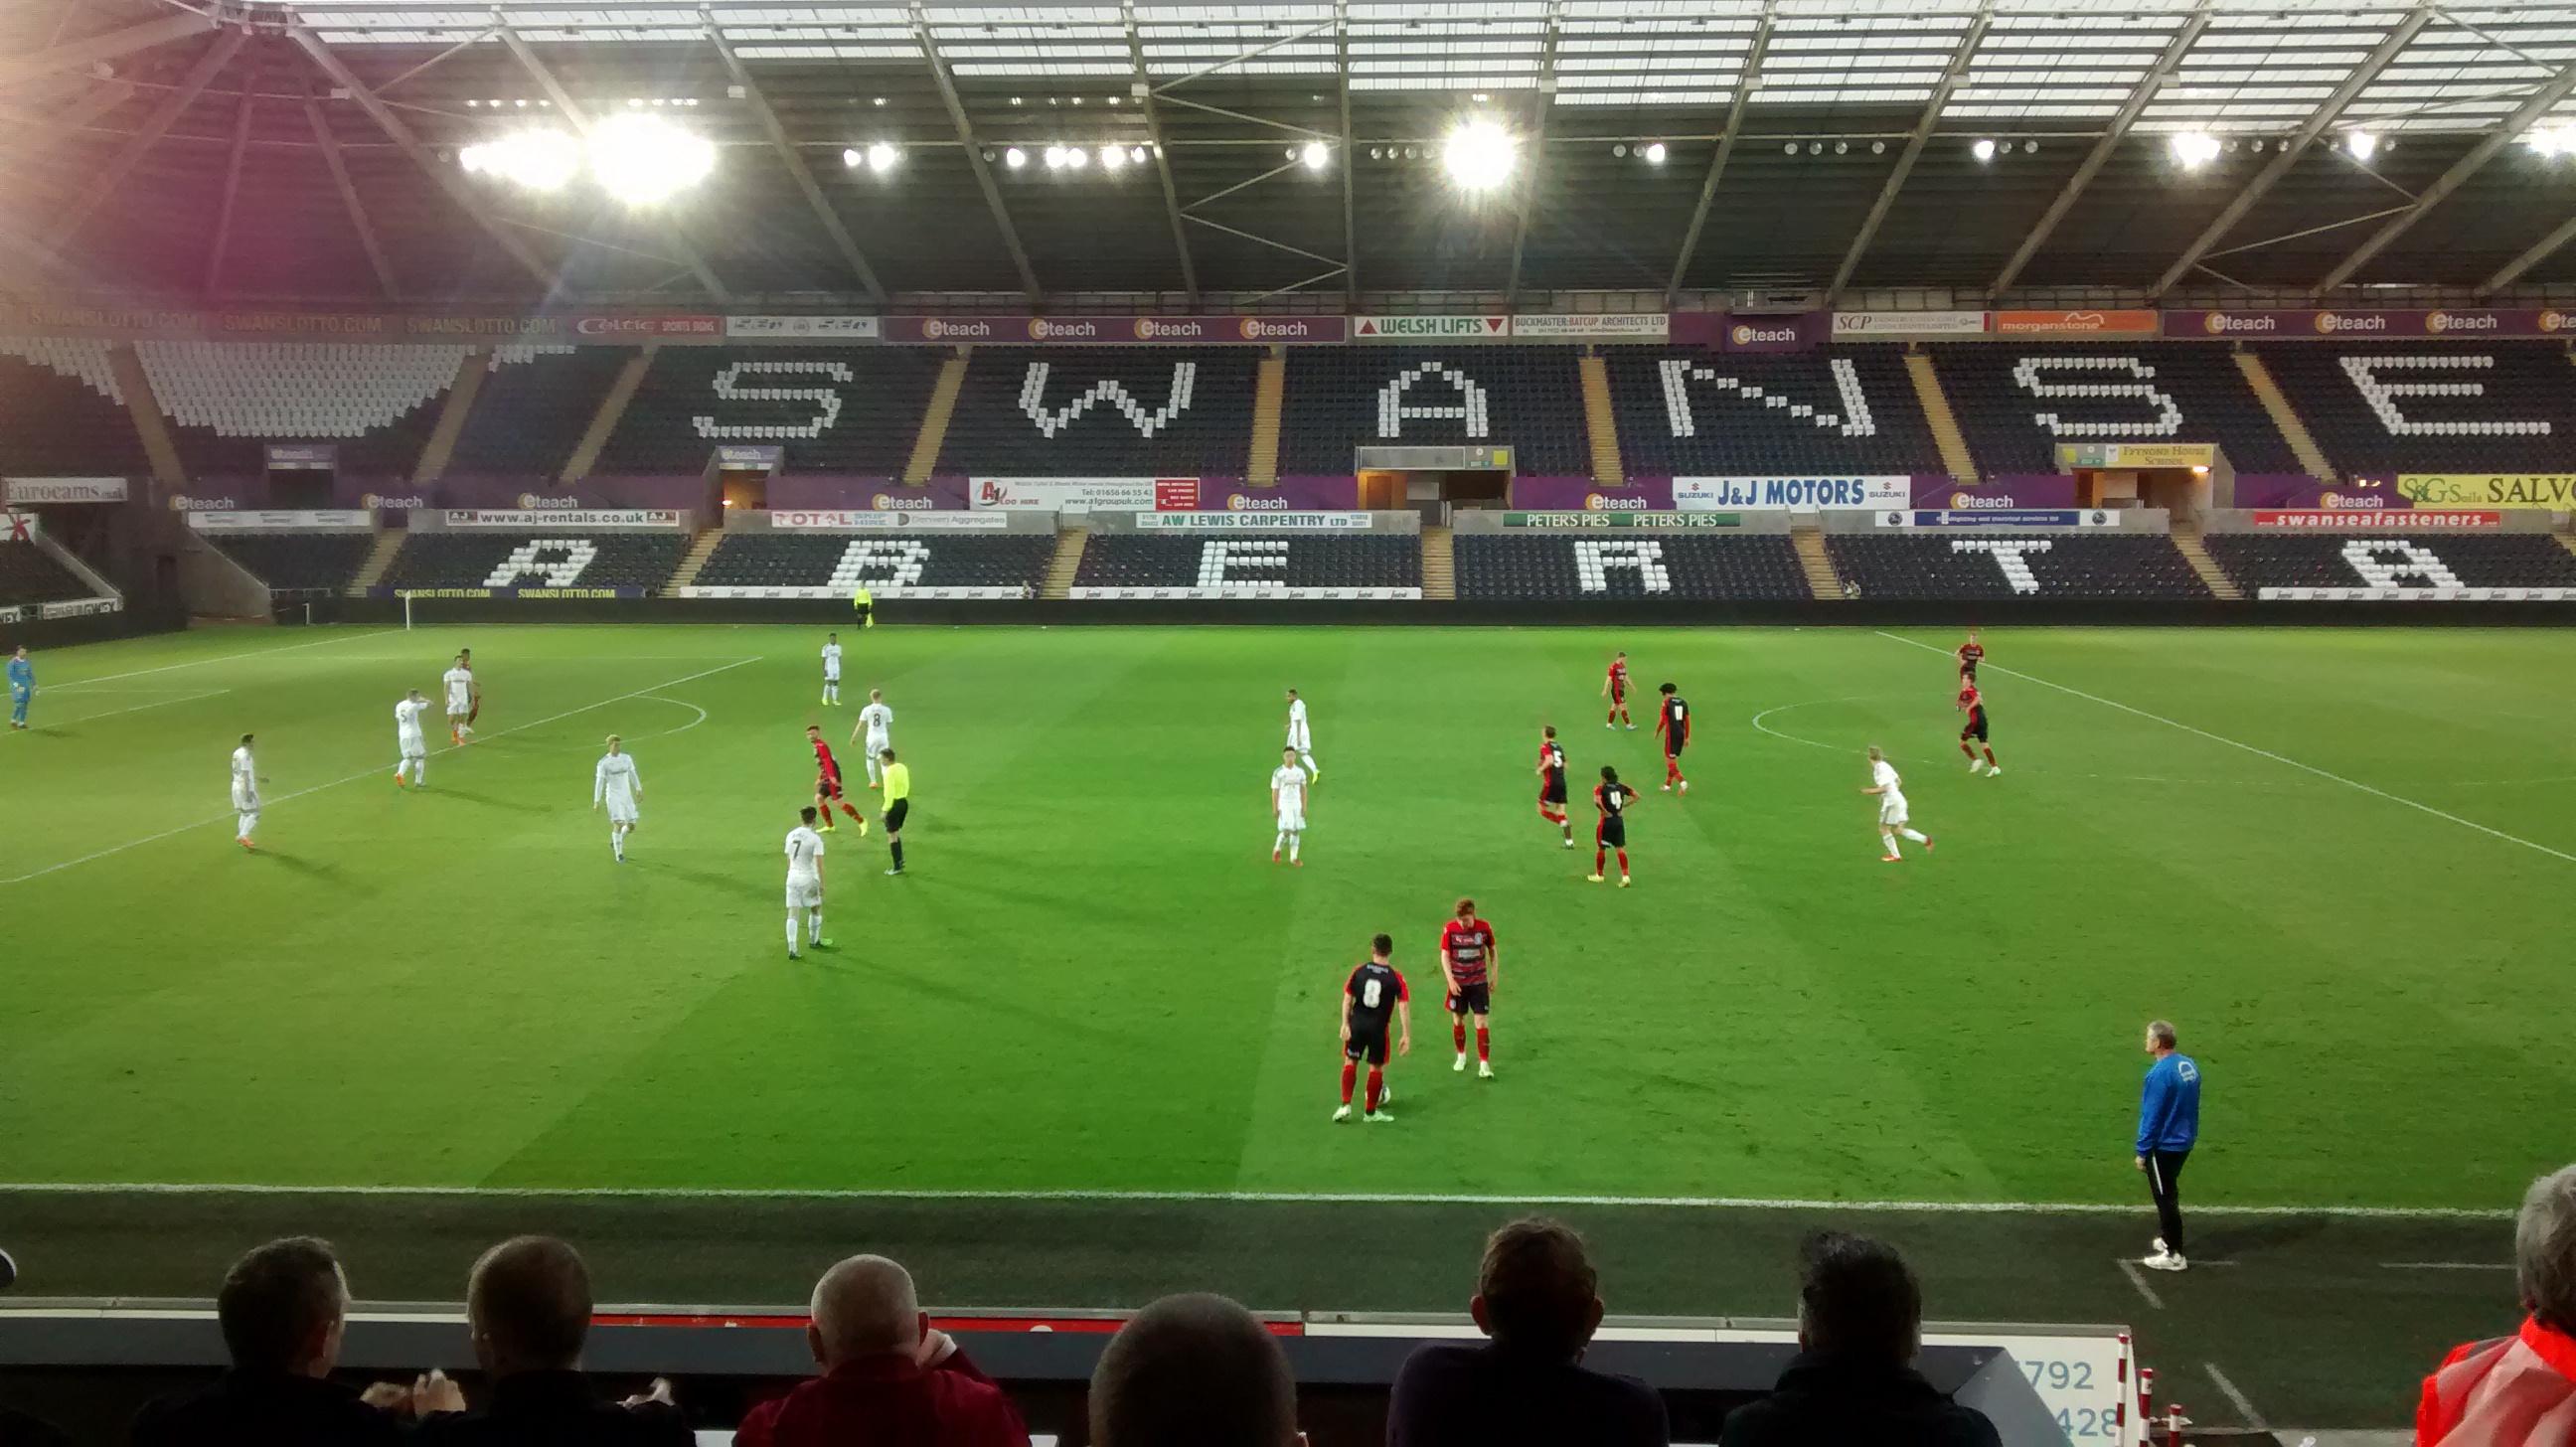 Swans U21s v Huddersfield U21s